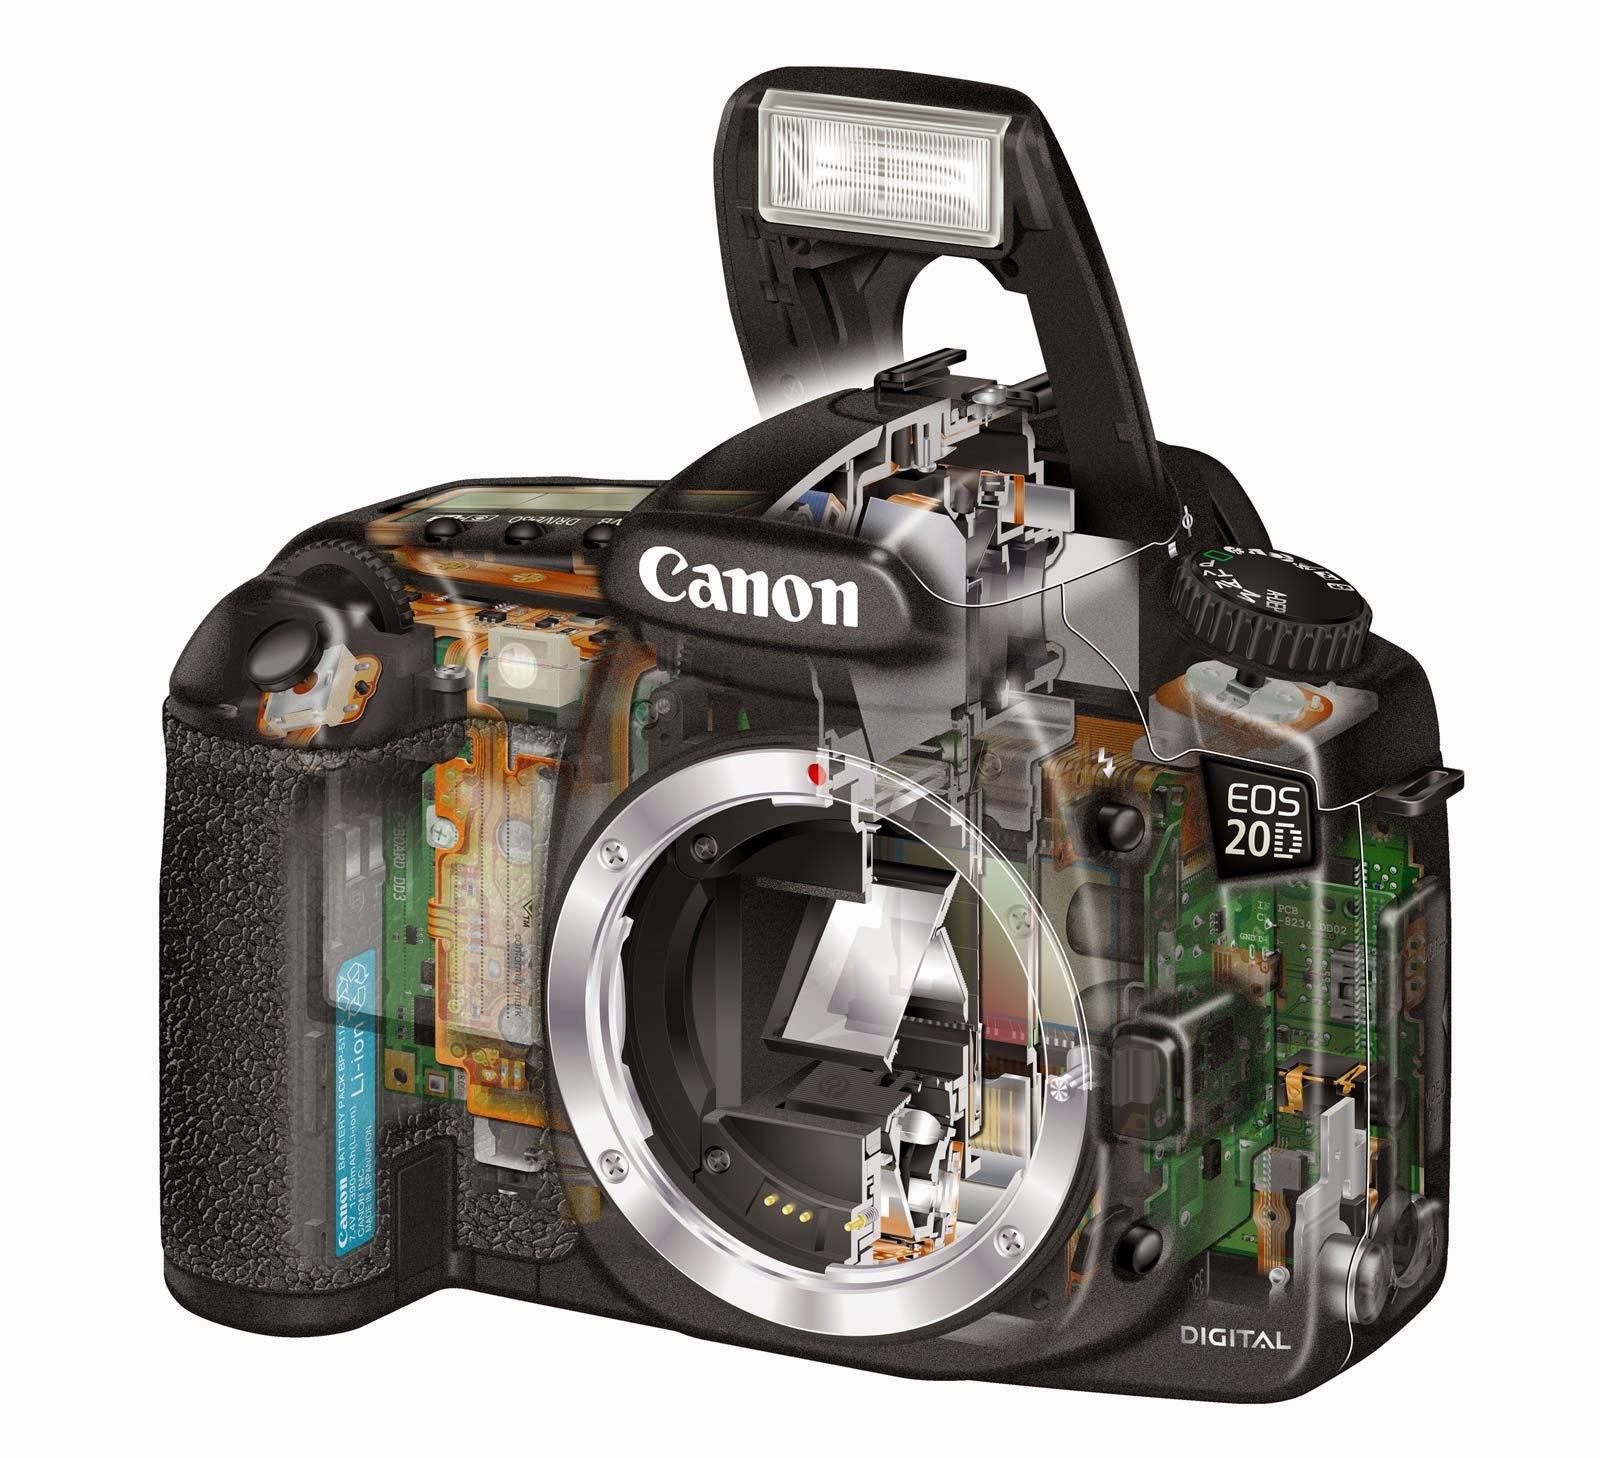 خصائص الكاميرا